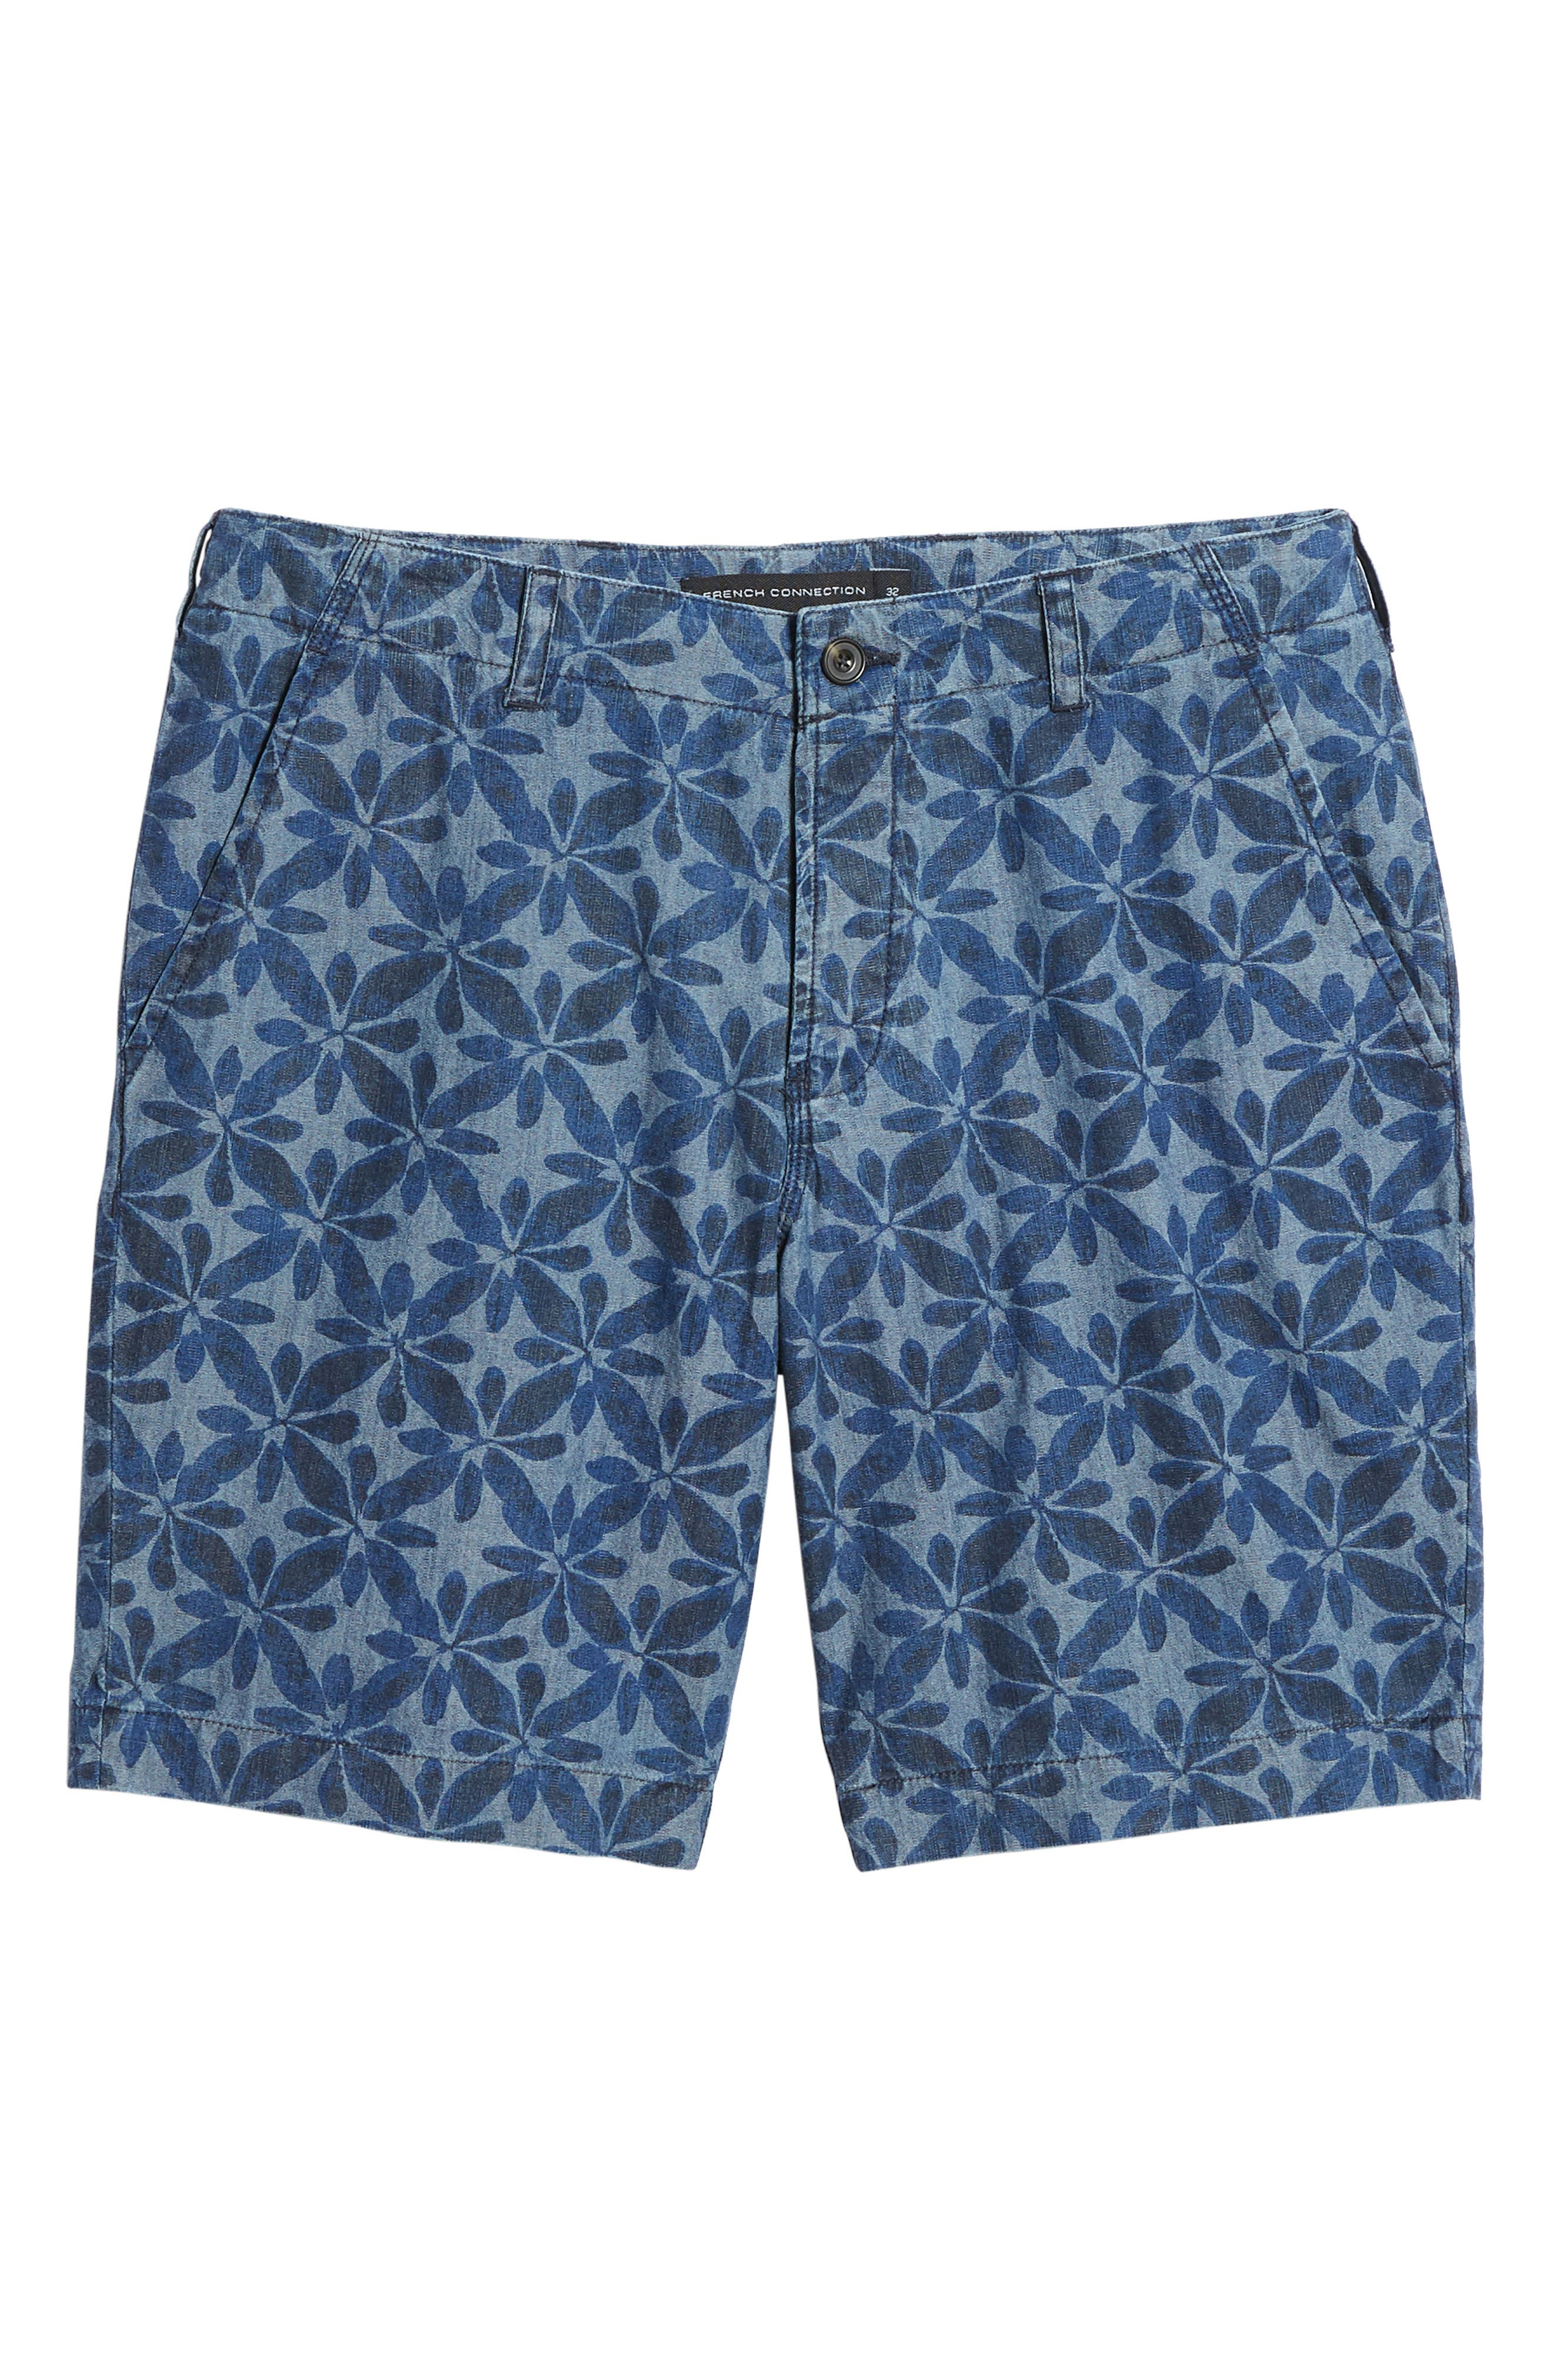 Franju Floral Cotton Shorts,                             Alternate thumbnail 6, color,                             Rinse And Softener